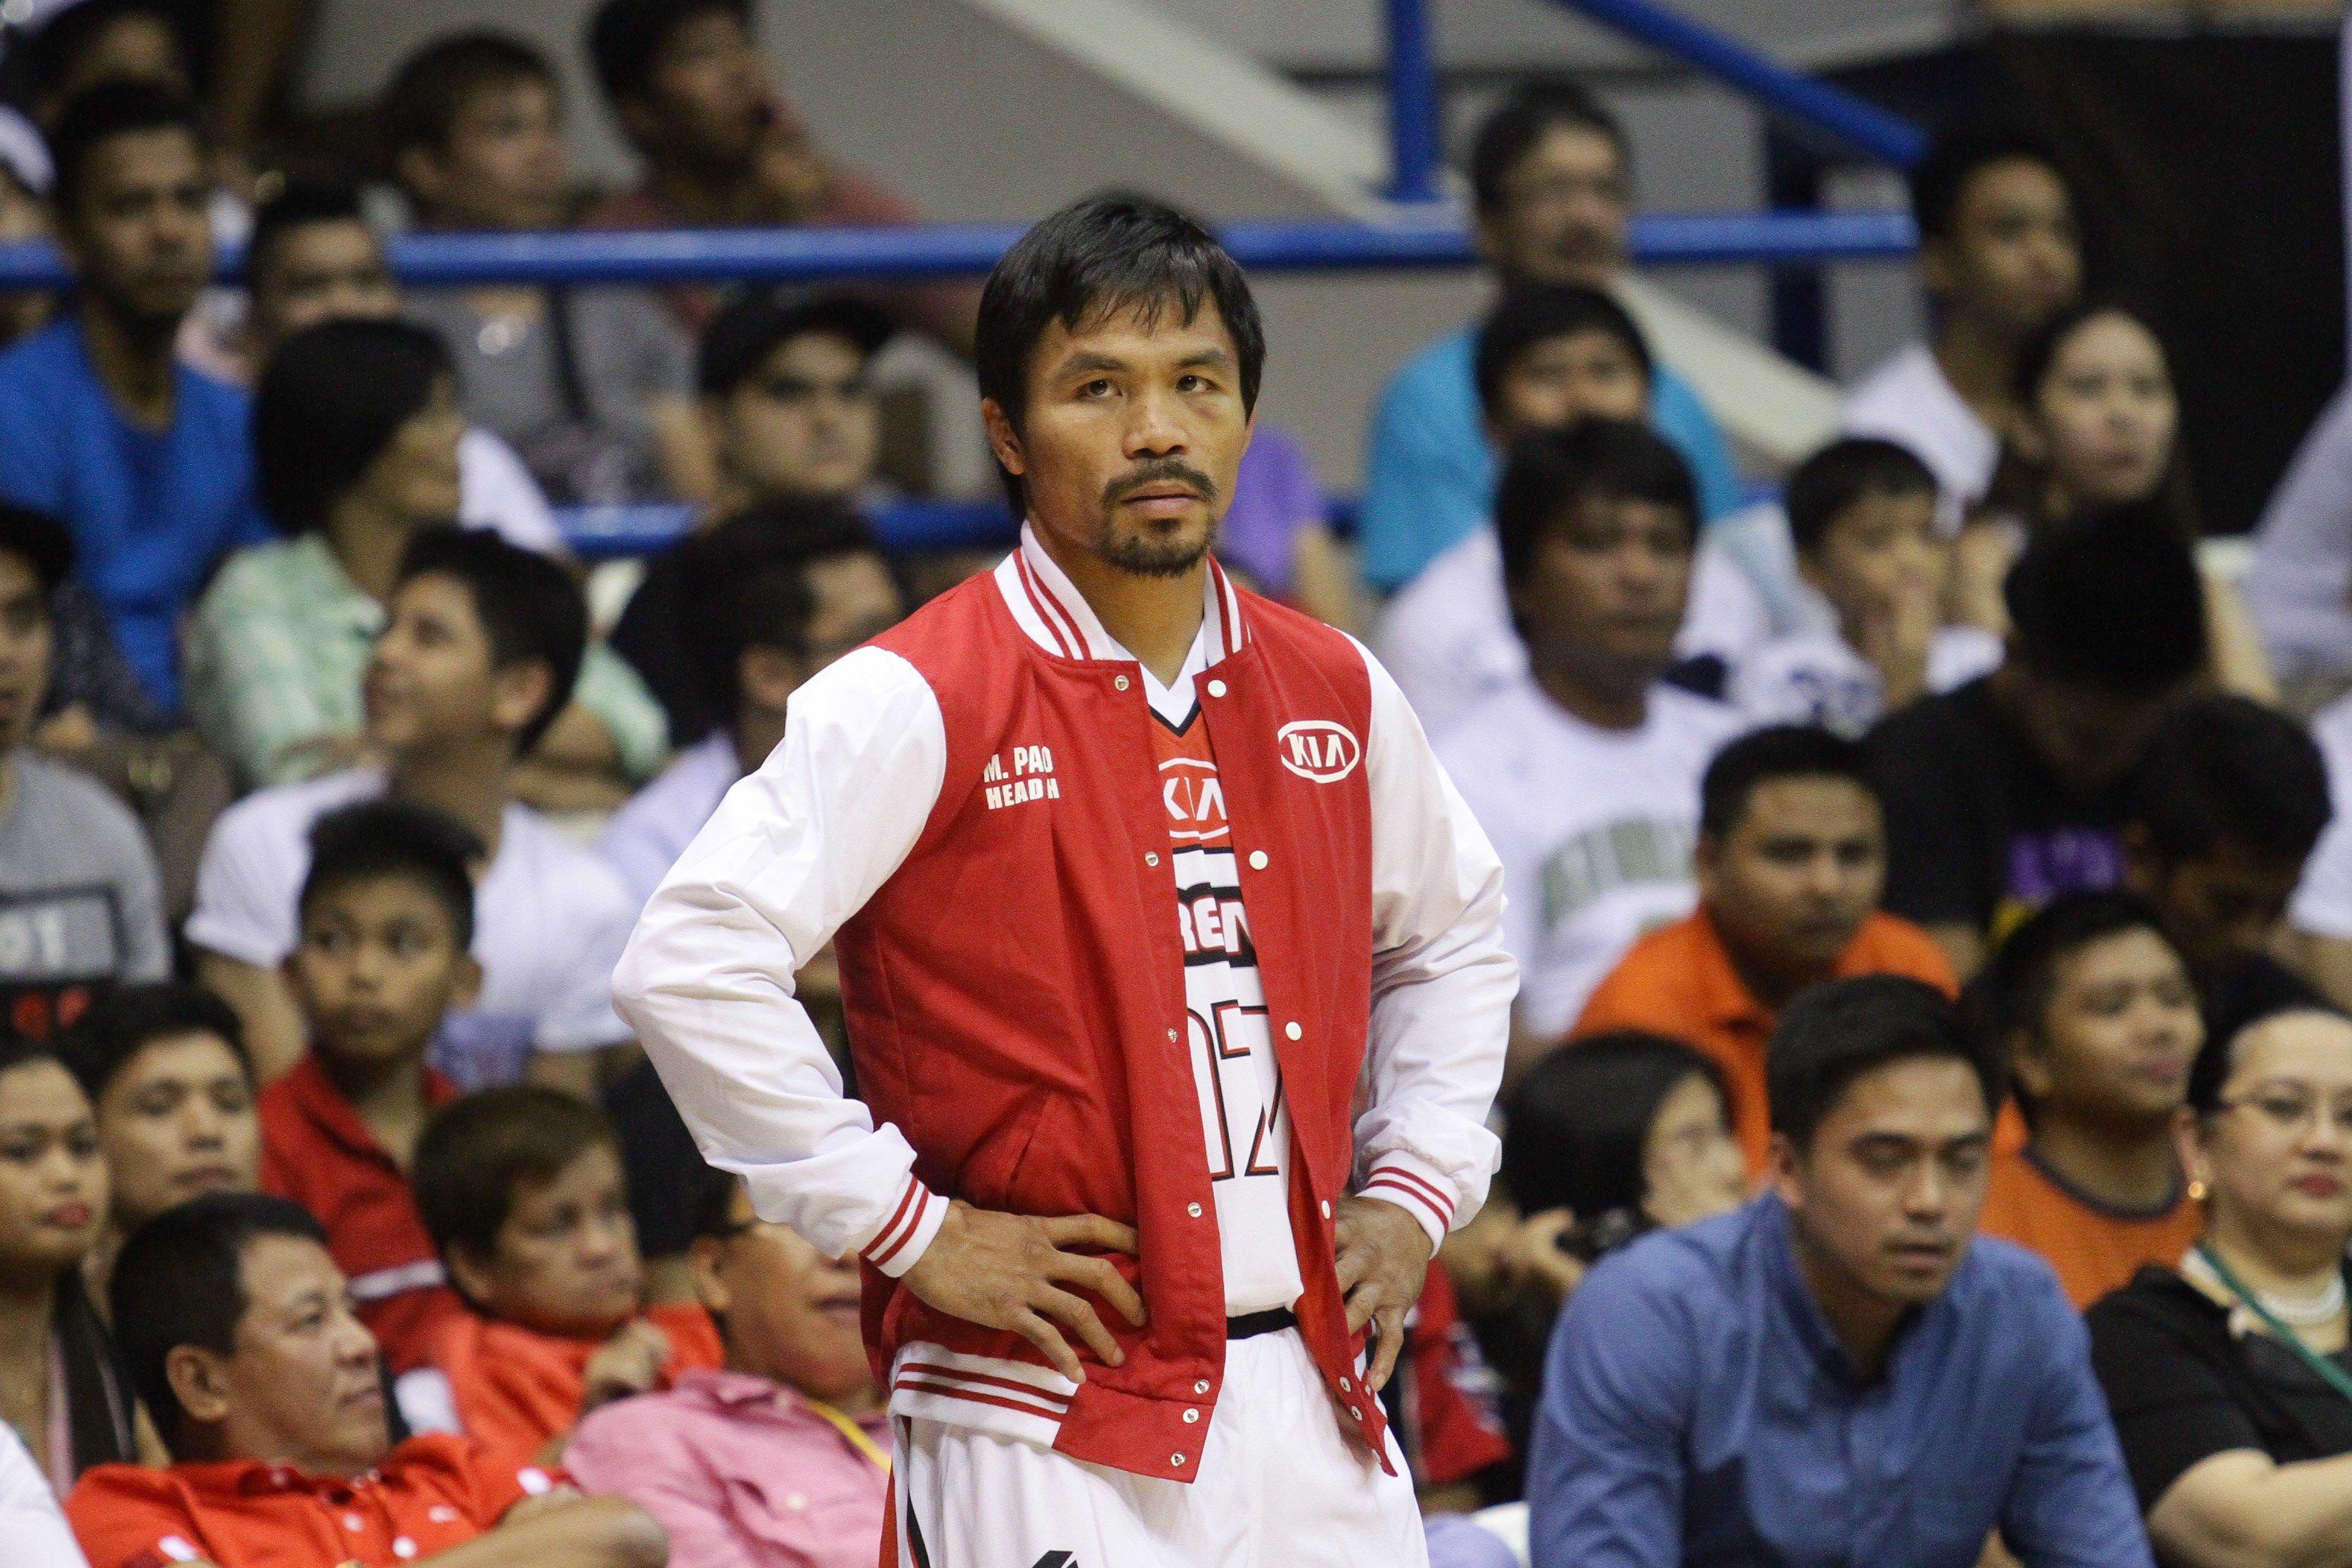 Manny Pacquaio returns to basketball